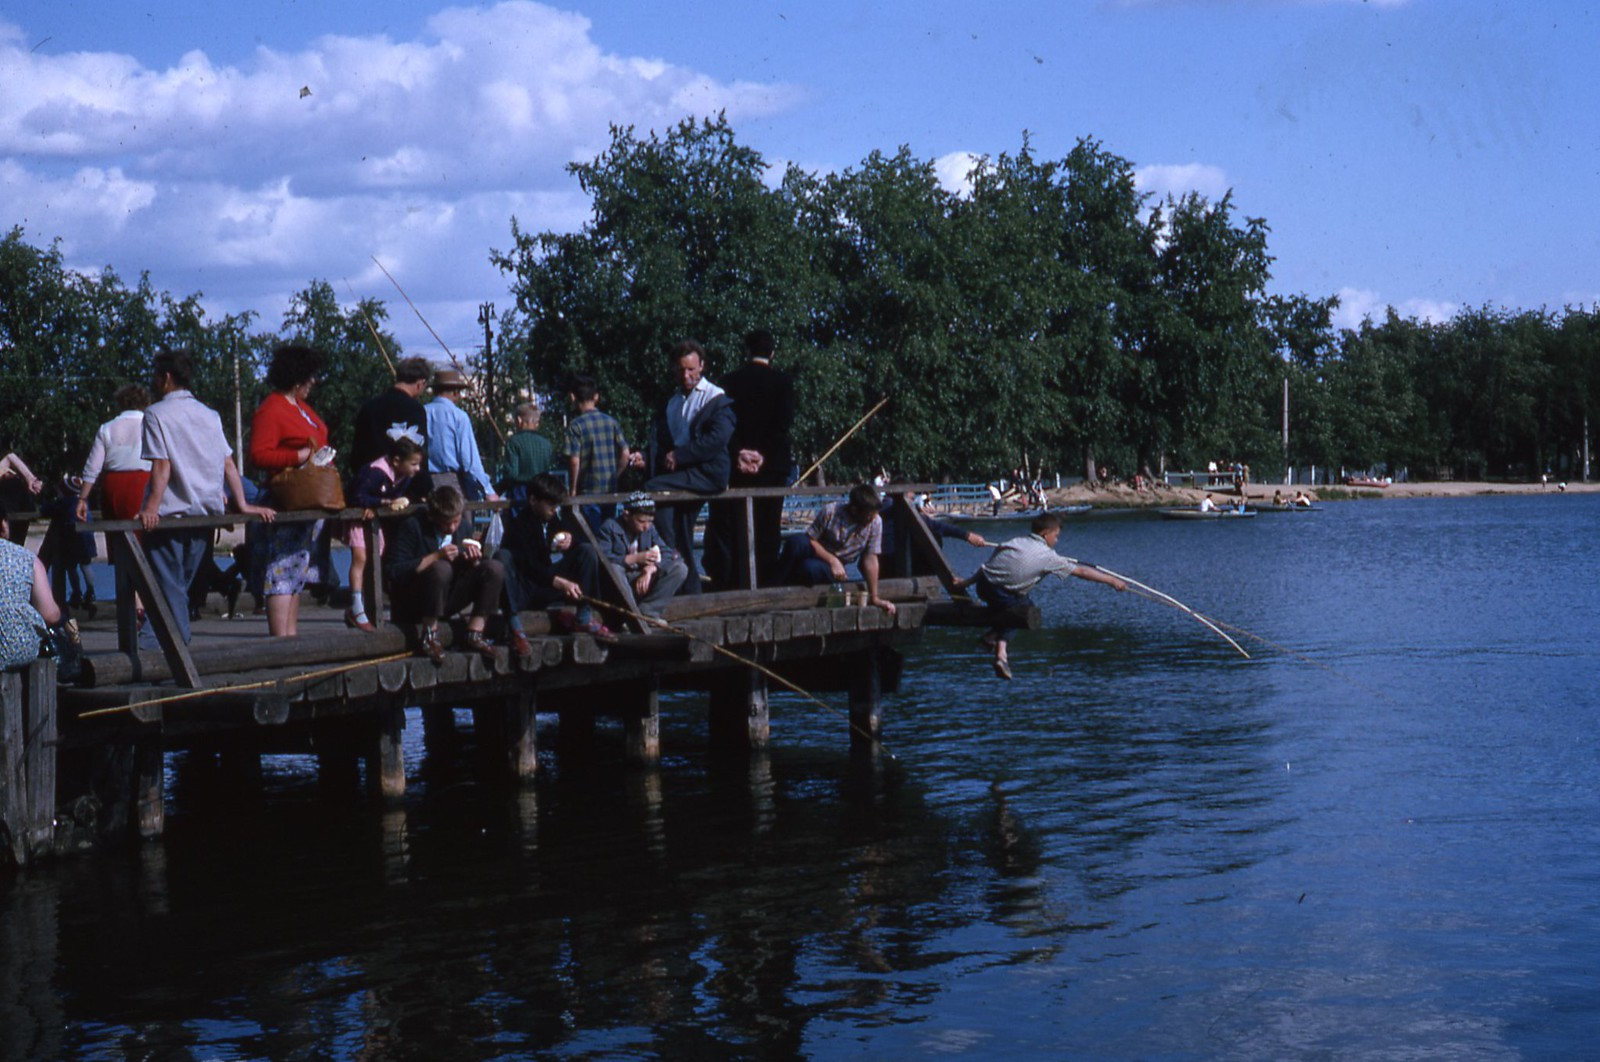 hammond-MA10-Ostankino-people-sunbathing-and-fishing-027